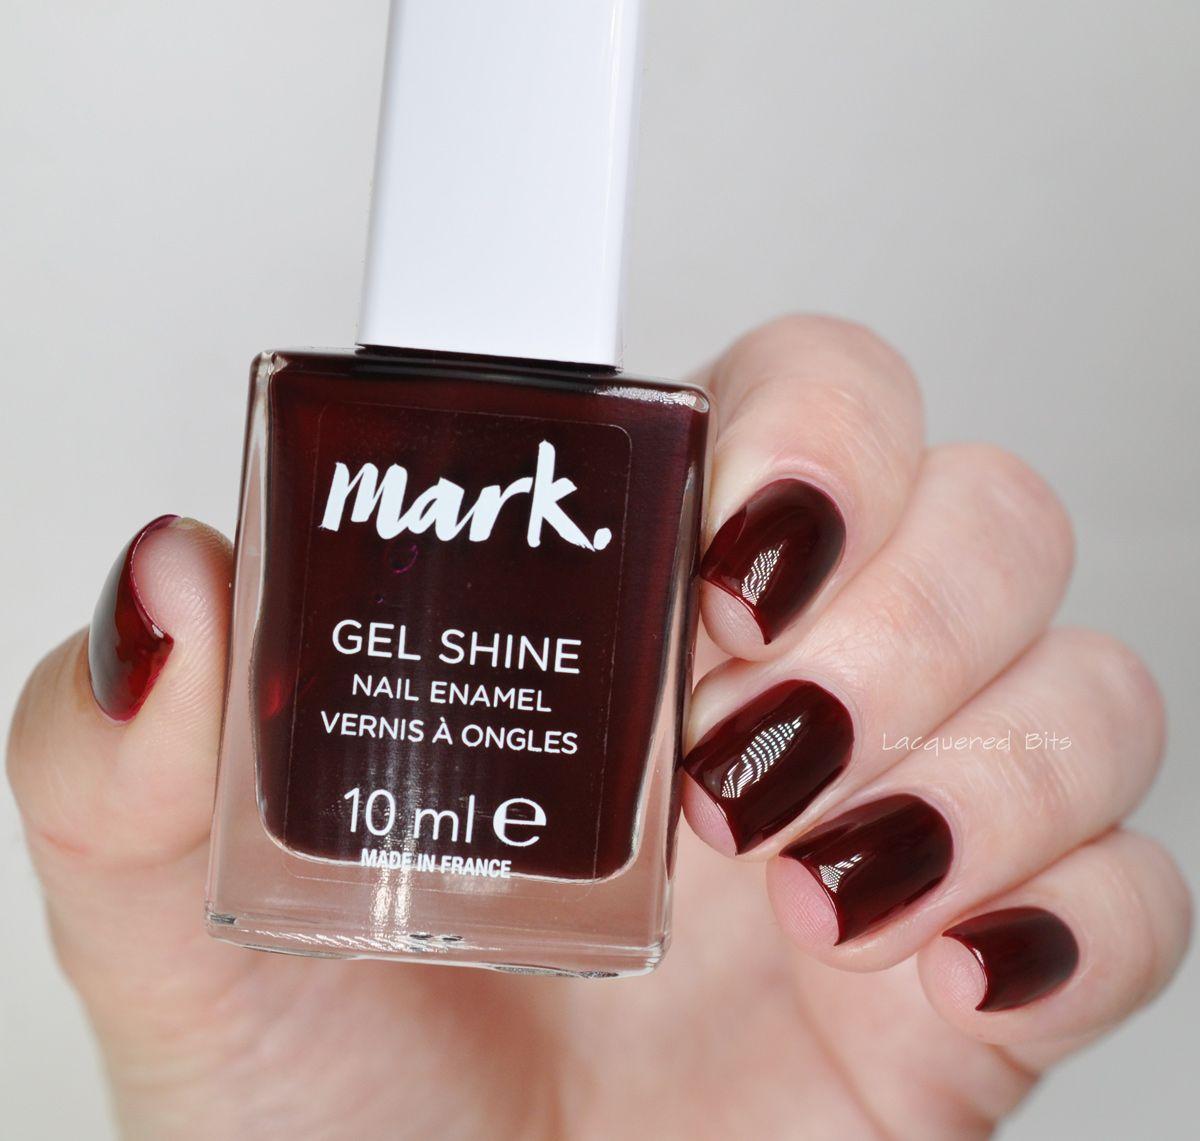 Avon Wine And Dine Me Avon Nails Nail Polish Avon Nail Polish